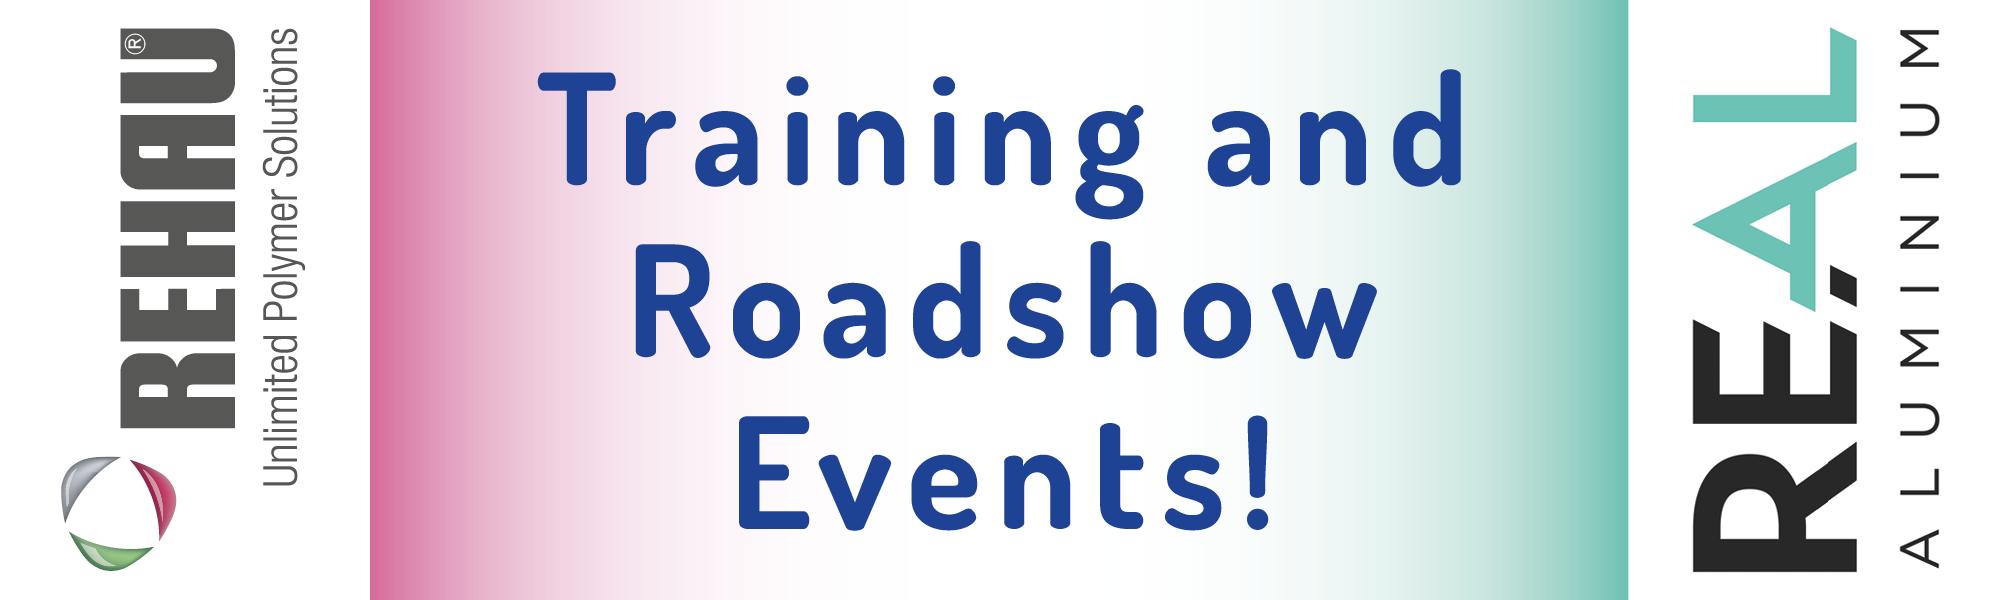 NEWS HEADER - Training & Roadshow.png